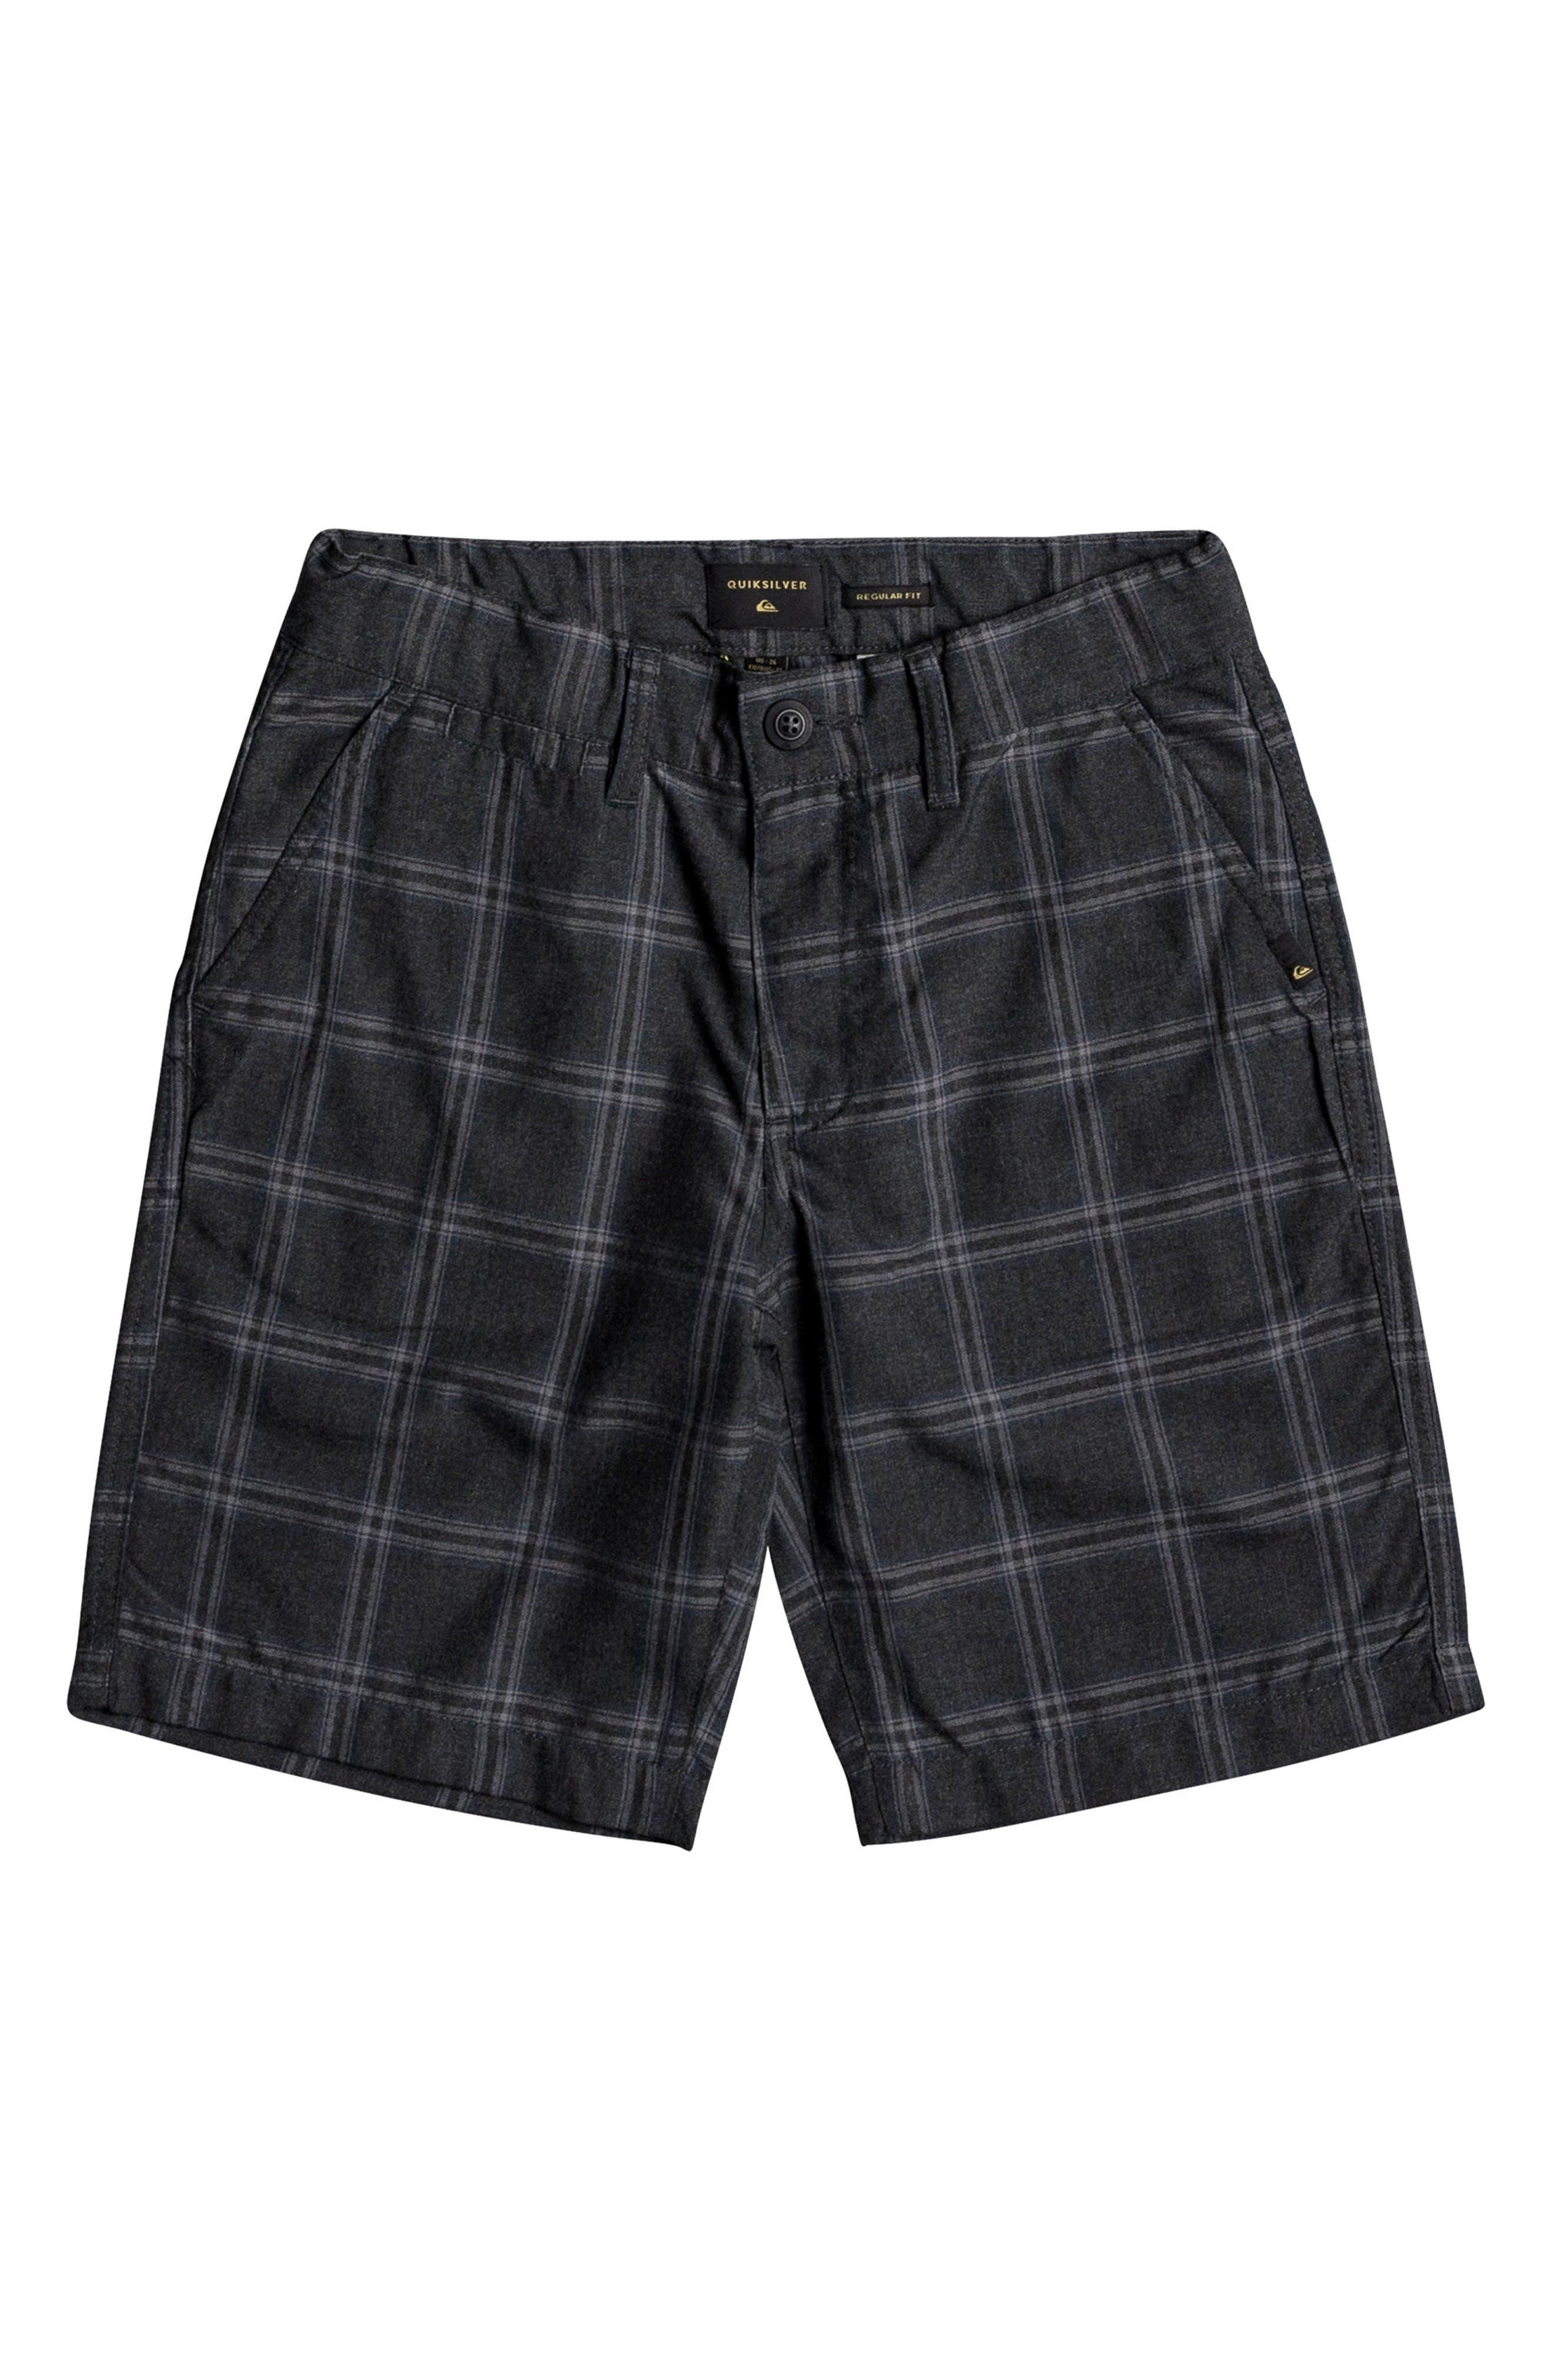 Regeneration Shorts,                         Main,                         color, Dark Grey Heather Regeneration